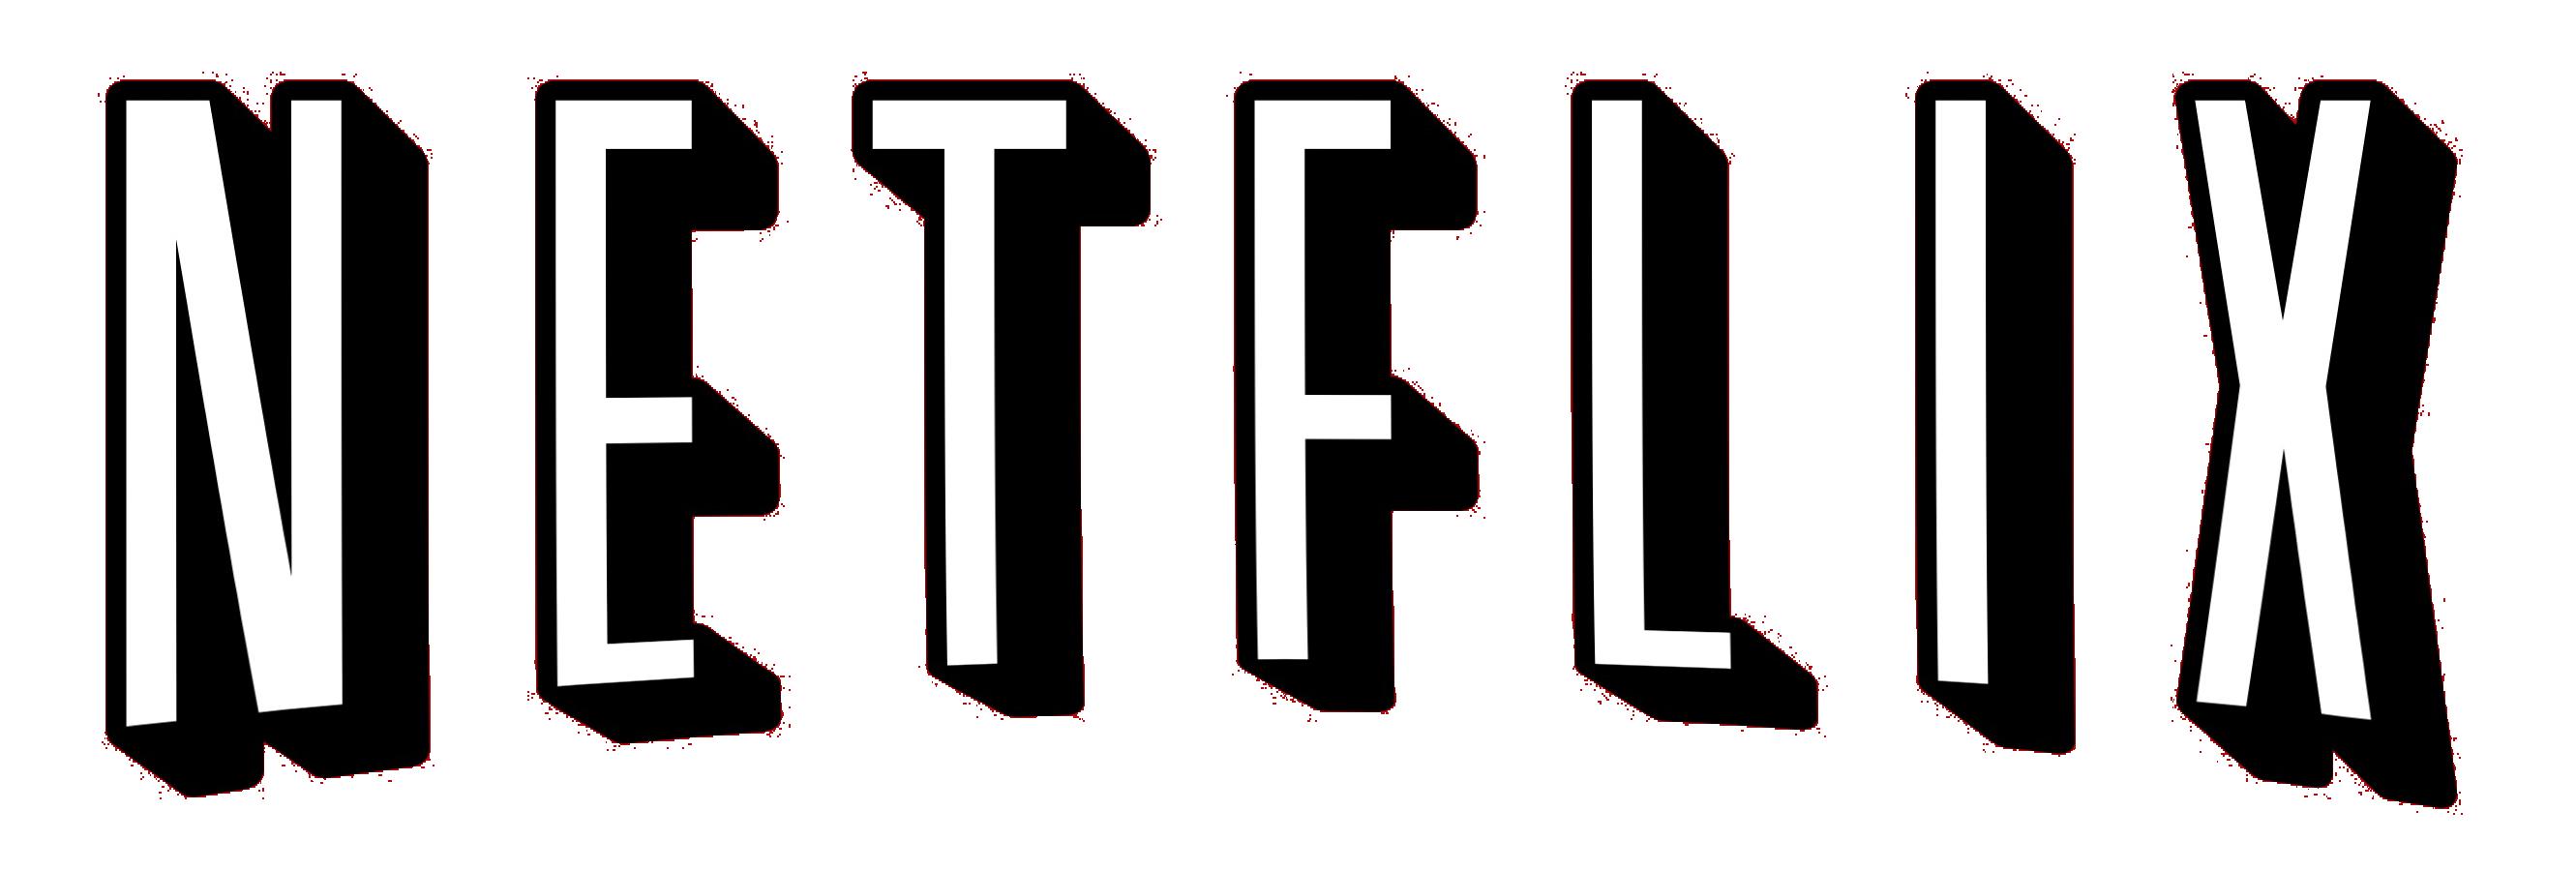 netflix-logo-png-2565   Cute coloring pages, Netflix, Art ... - Netflix Logo Coloring Pages